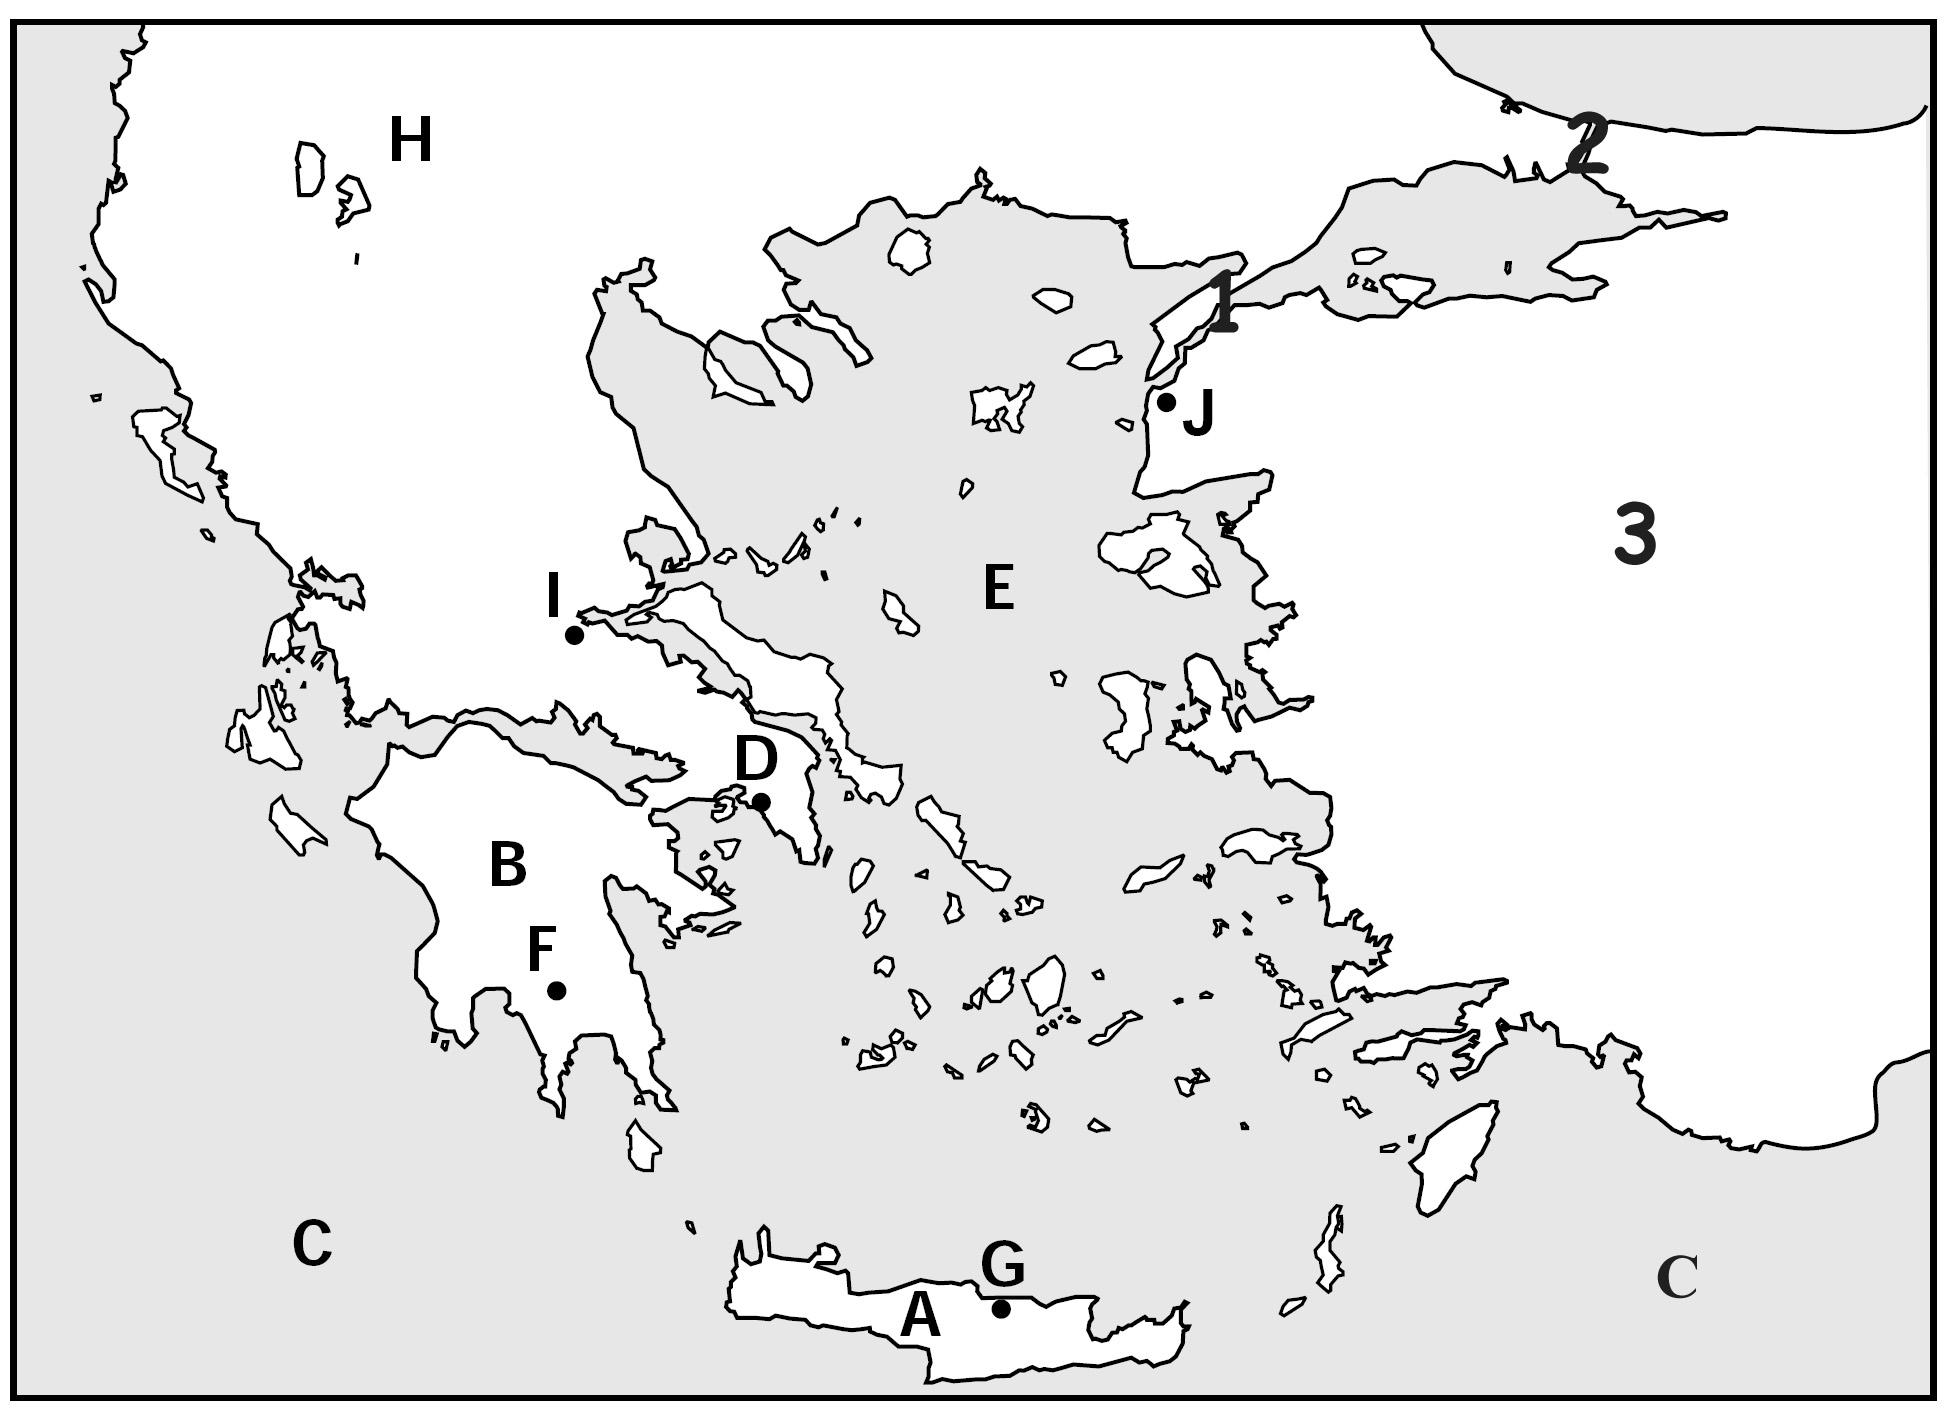 Ancient Greece Map Quiz ImageQuiz: Ancient Greece Map Quiz